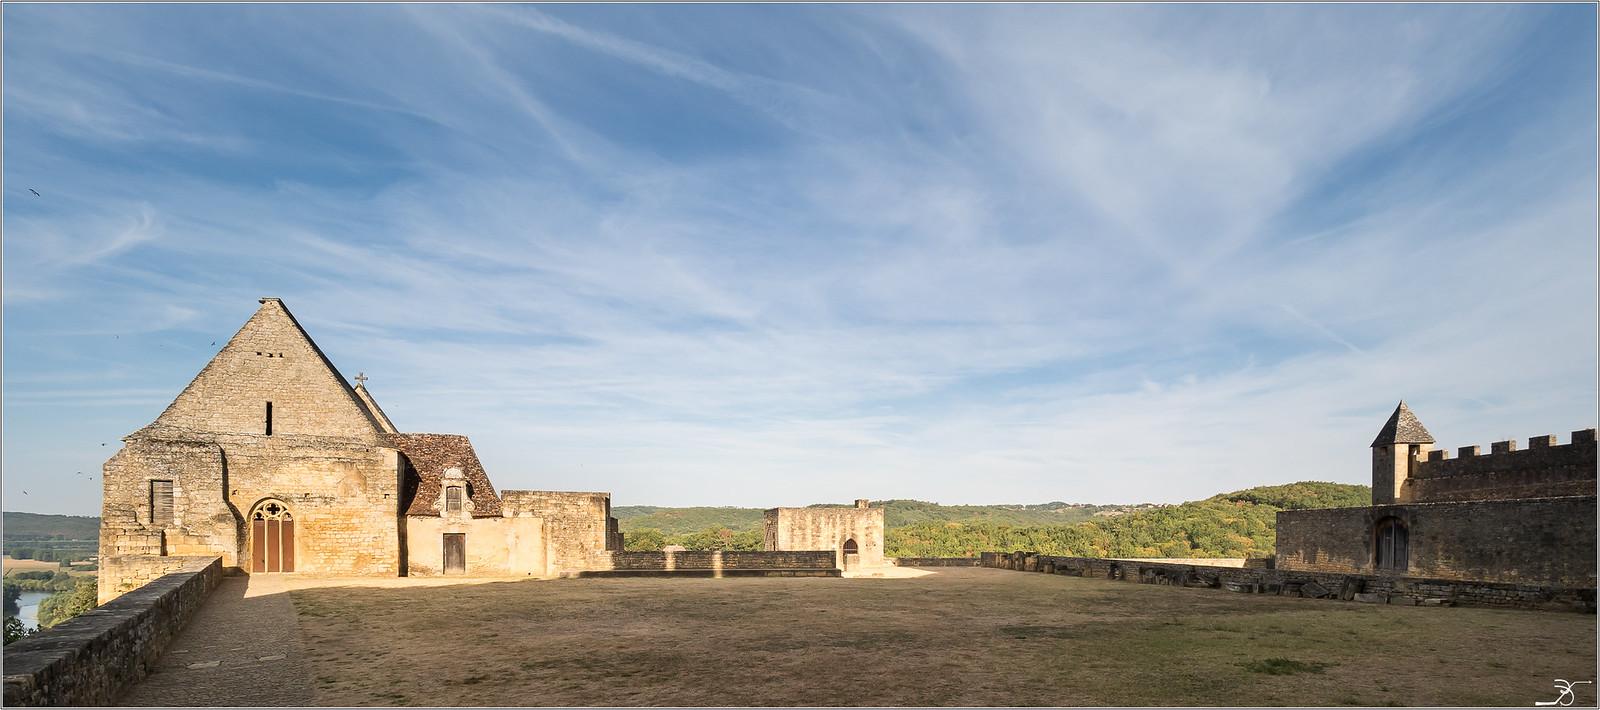 Grands Angles au chateau de Beynac 29901362606_40929461a5_h